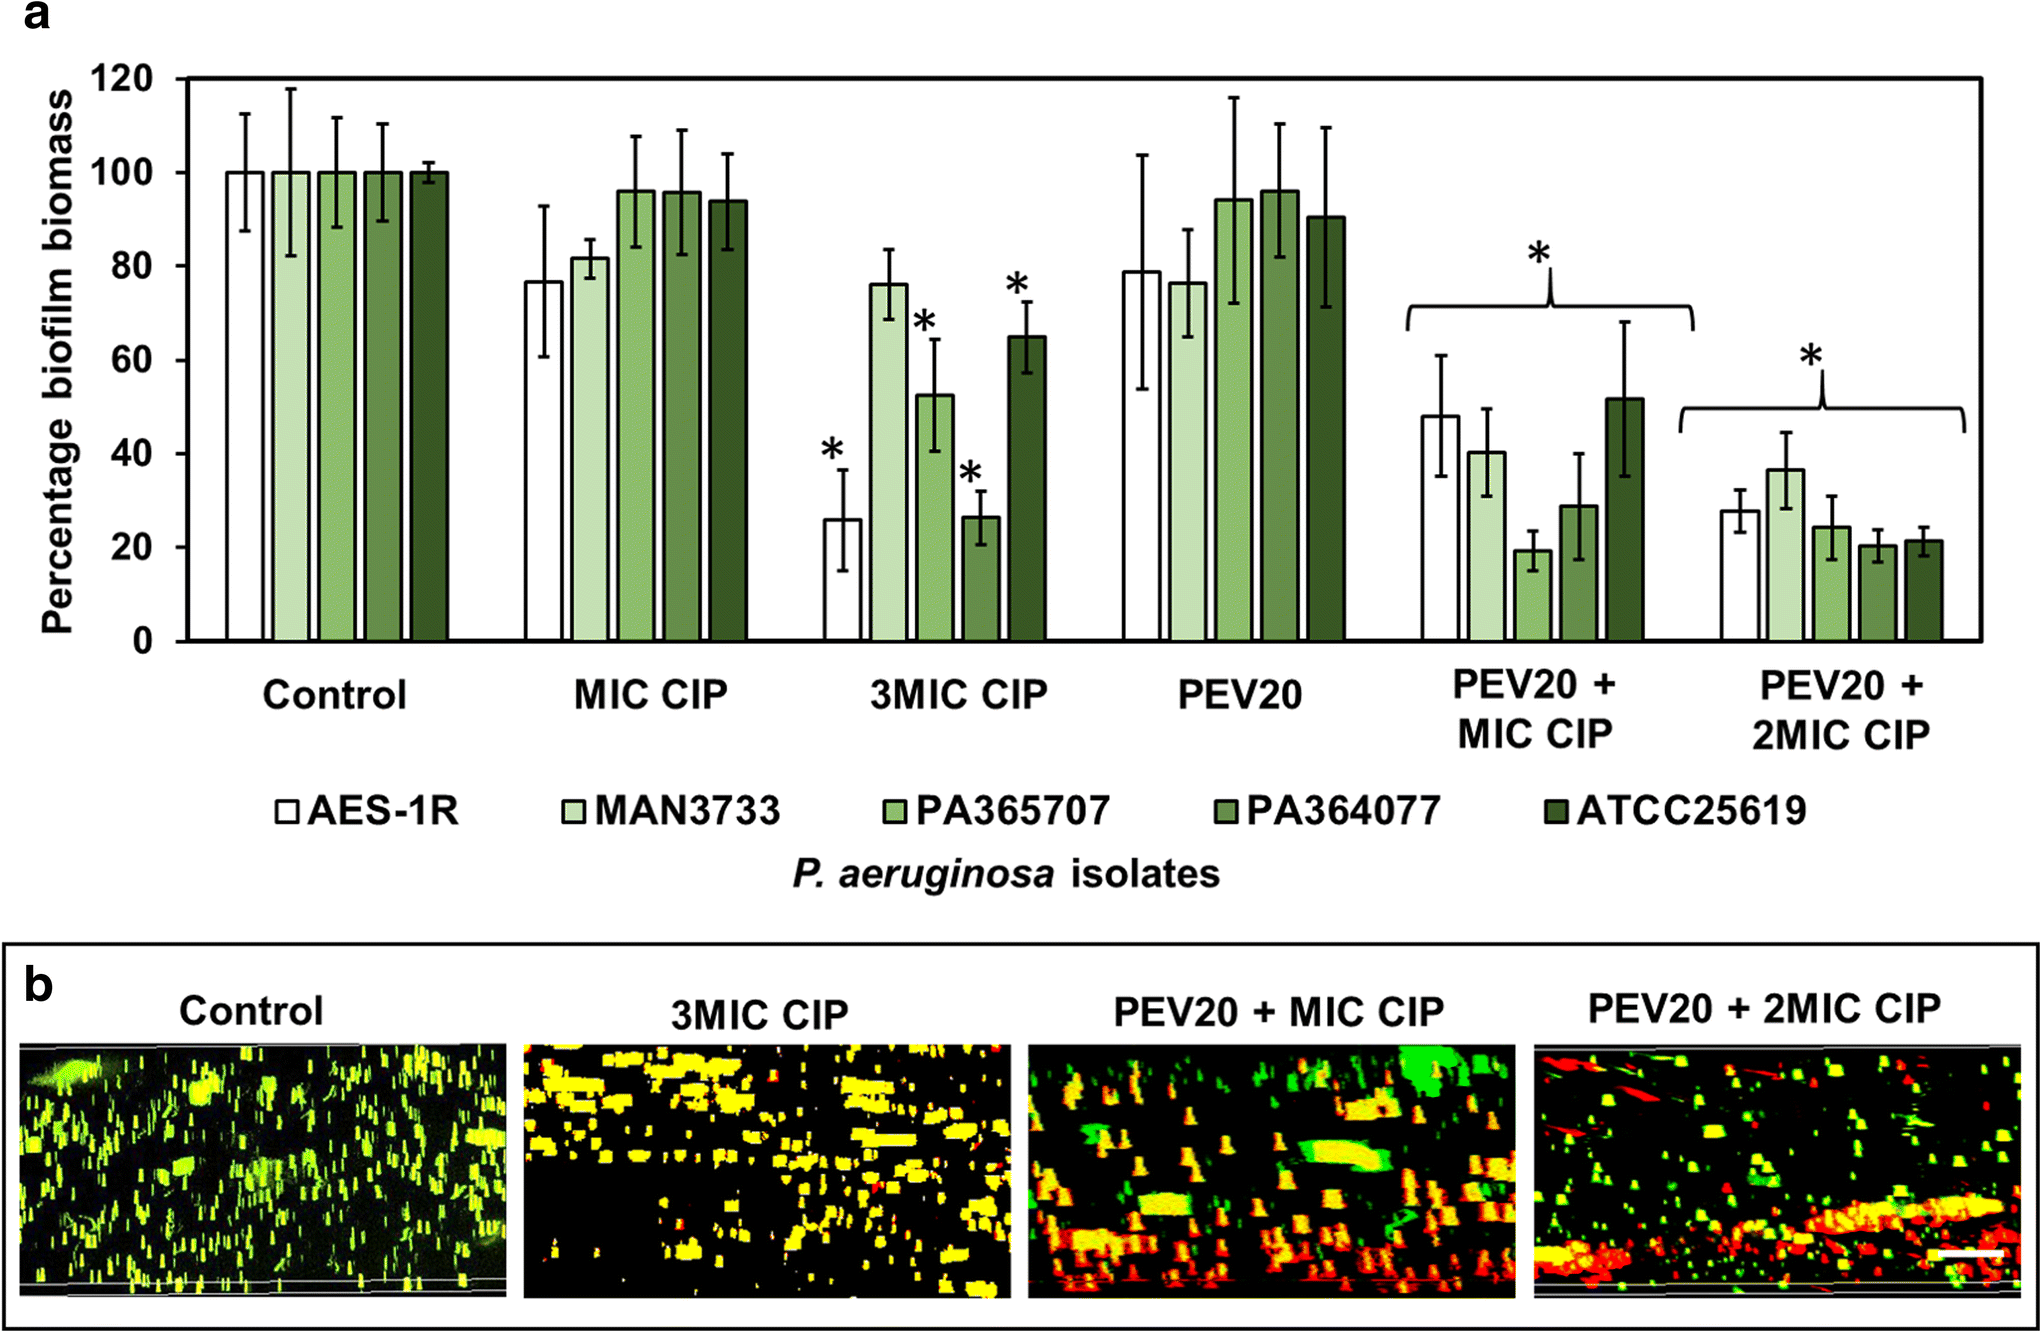 Bacteriophage PEV20 and Ciprofloxacin Combination Treatment